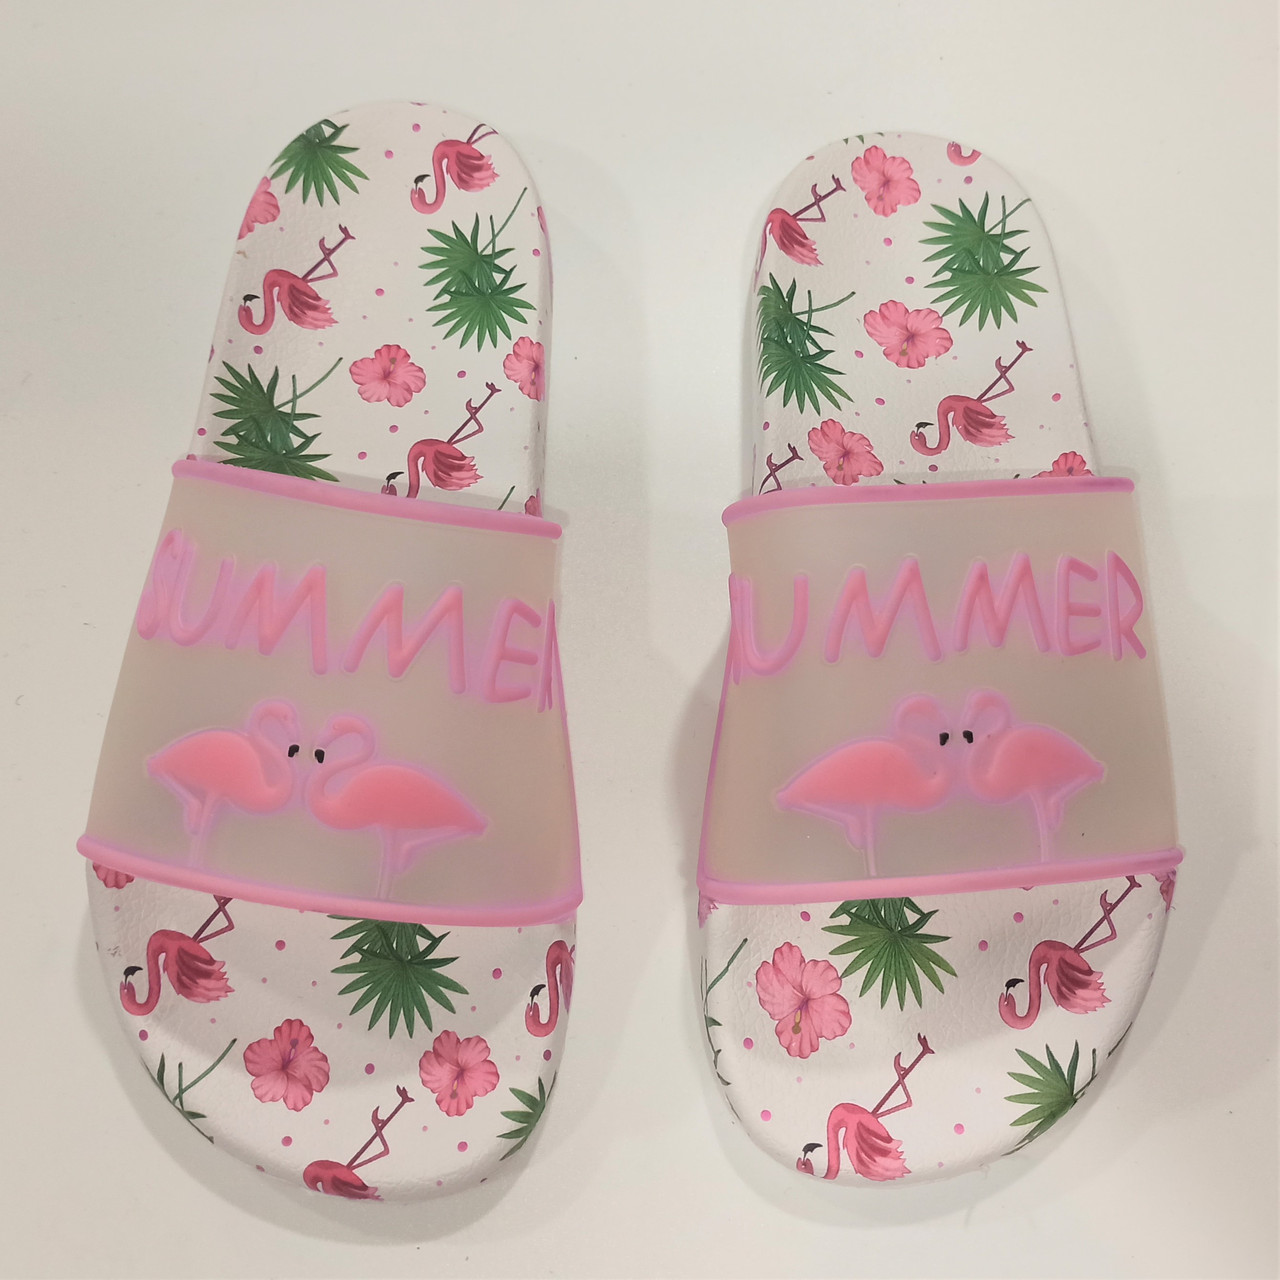 Шлепанцы с фламинго розовые, Calypso размеры: 37-41